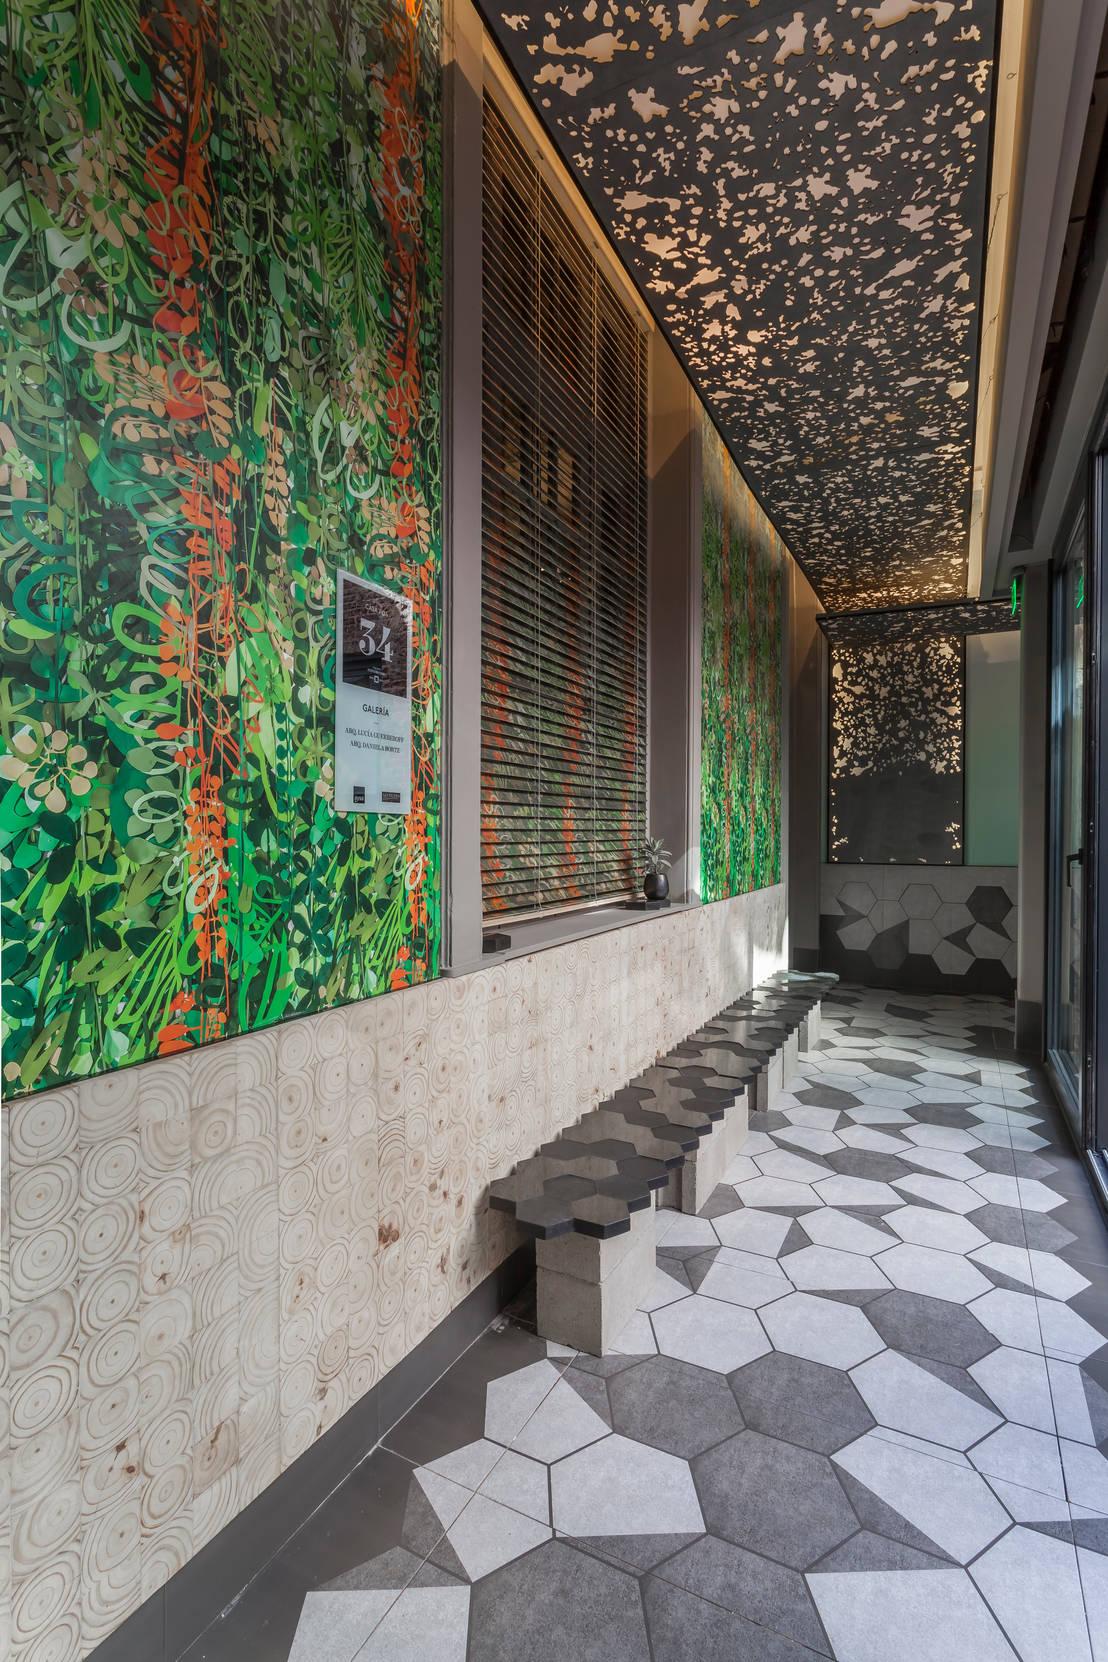 Casa foa 2015 espacio galeria de matealbino arquitectura for Homify galerias